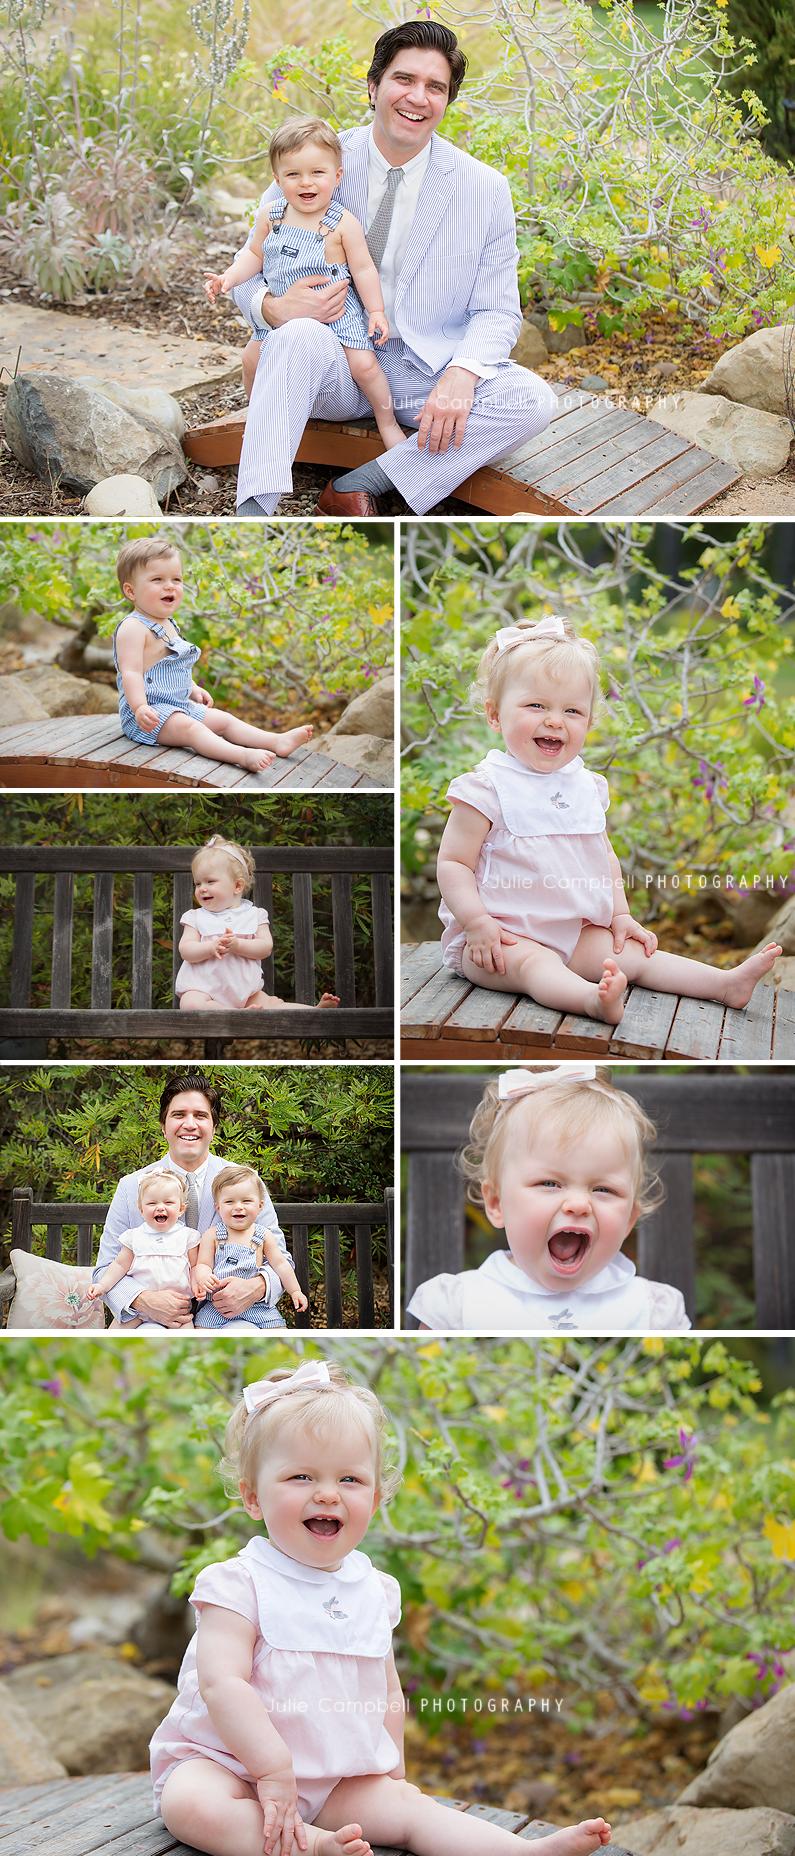 Thousand Oaks Children's Photographer